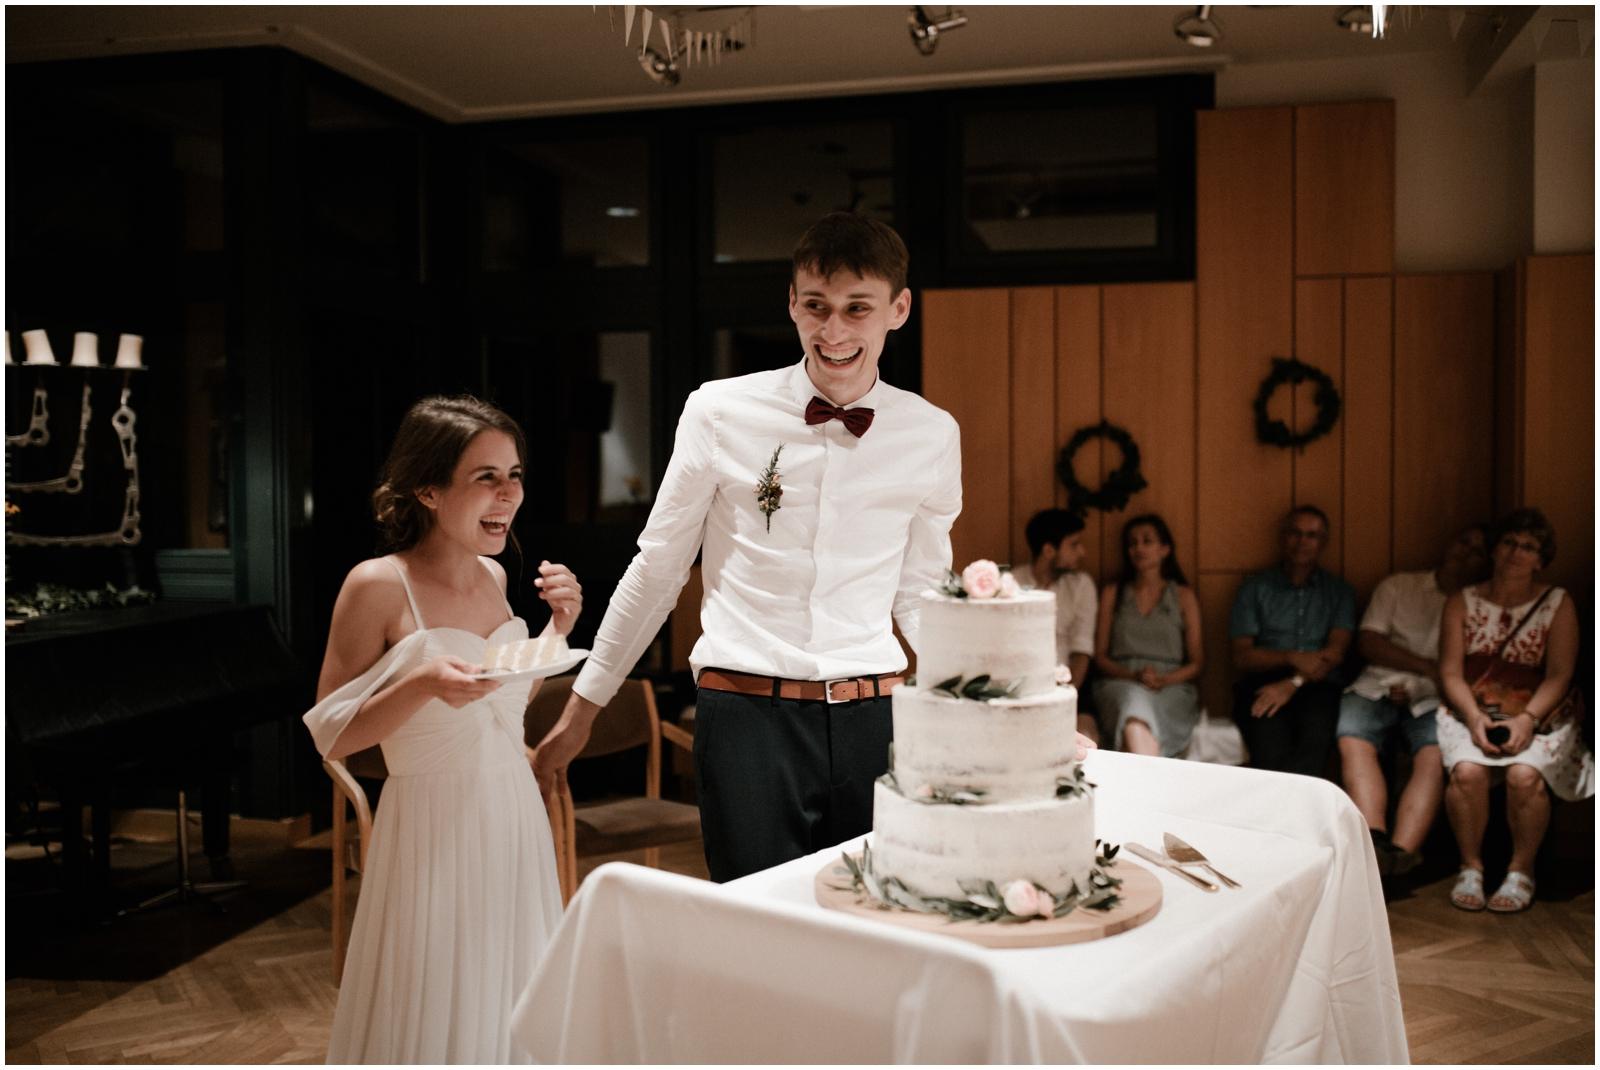 mirjam_thomas_wedding-657.jpg